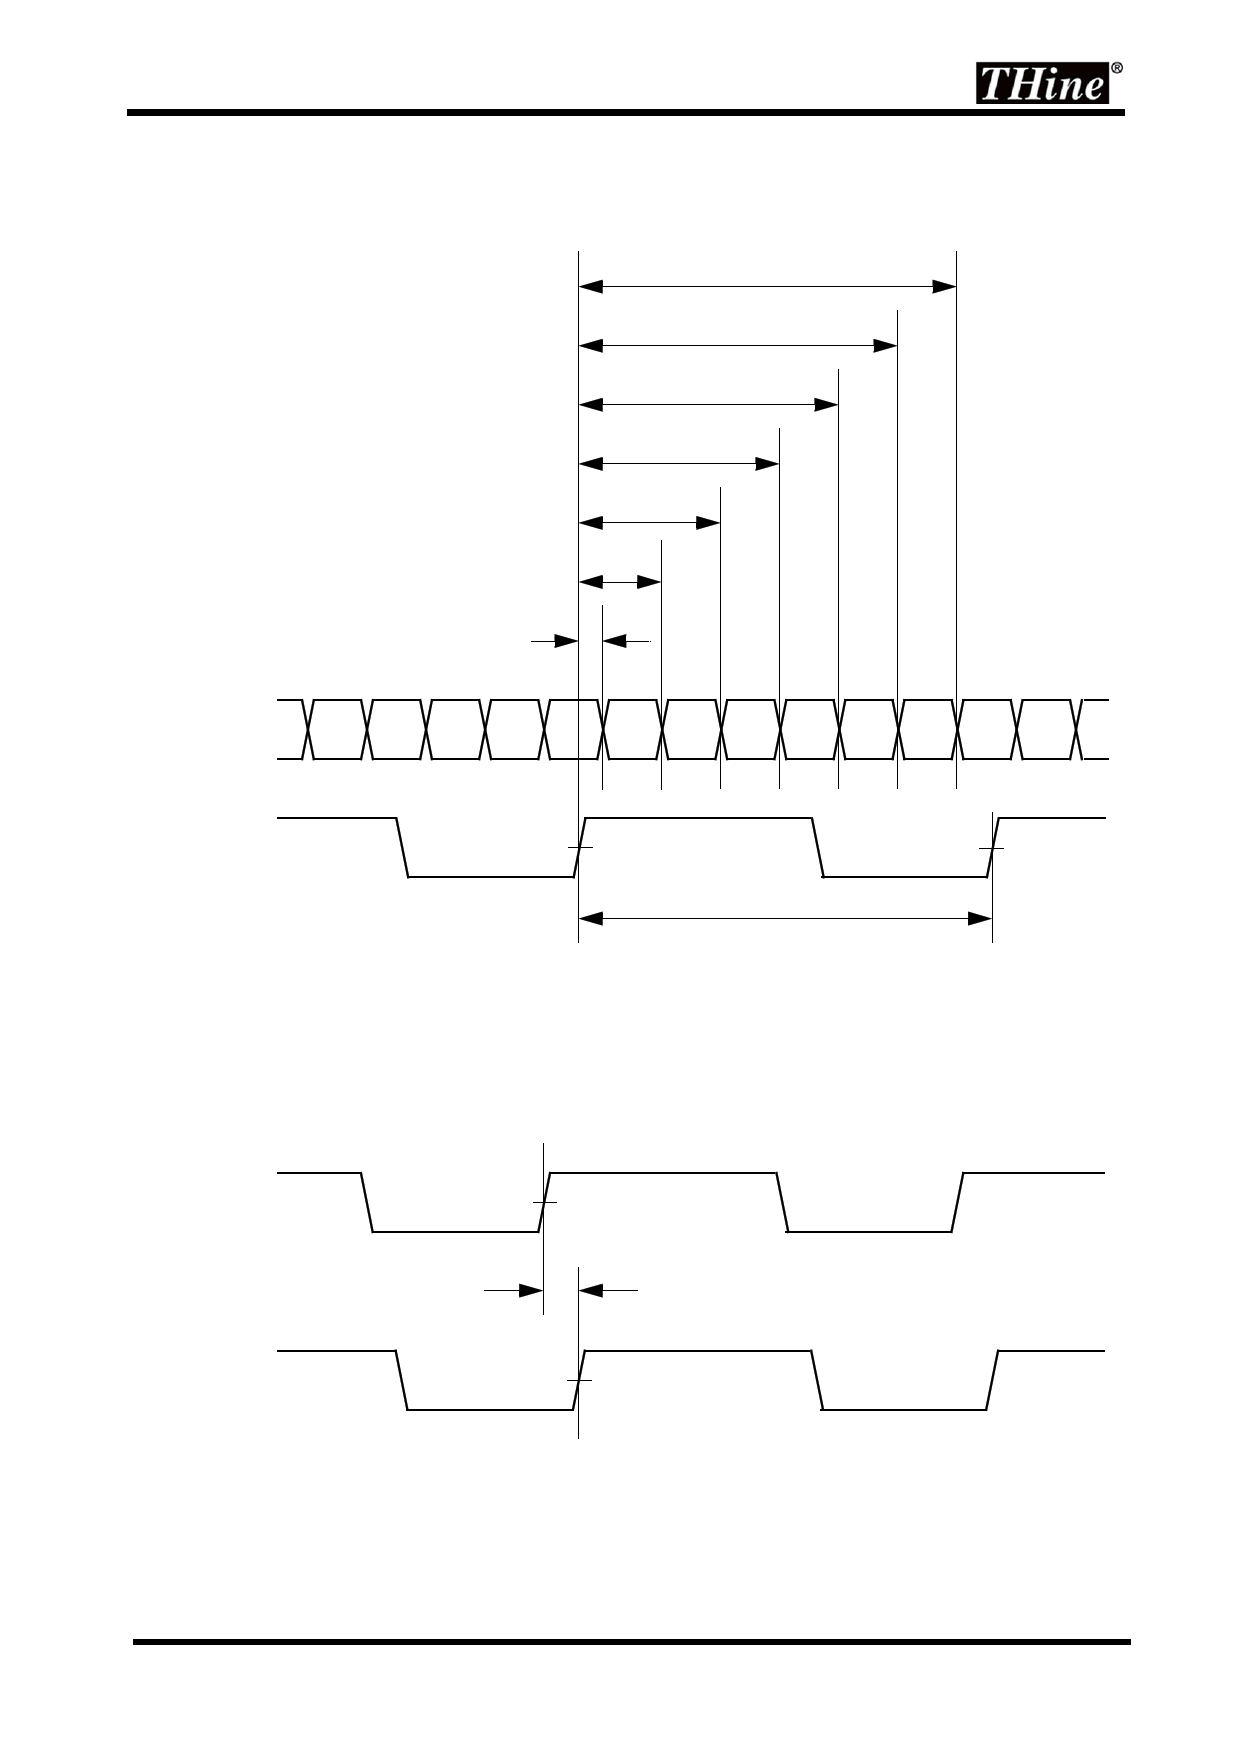 THC63LVD824A transistor, diode fet, igbt, scr